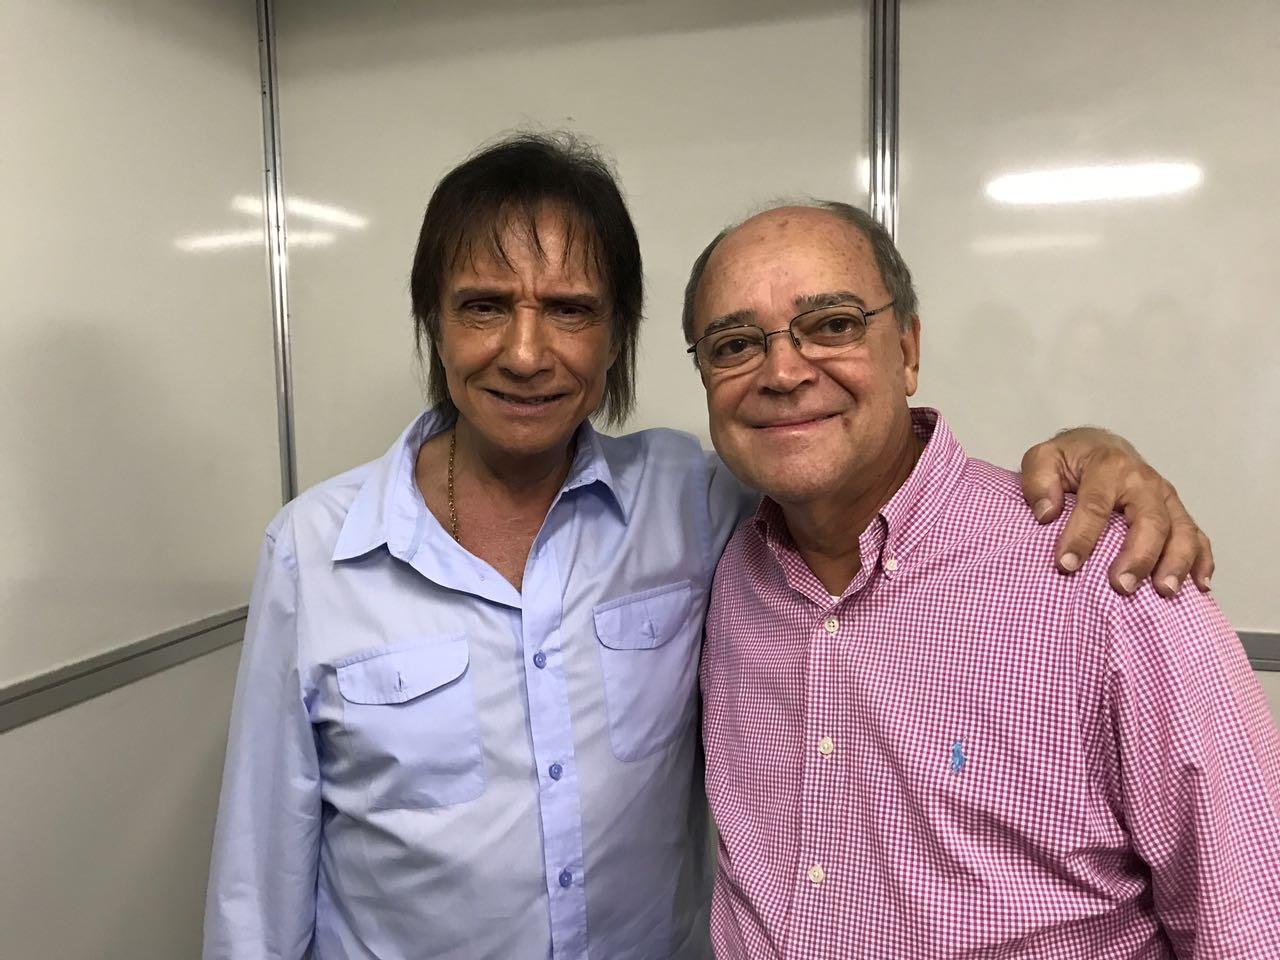 Antonio Jorge Almeida Santos